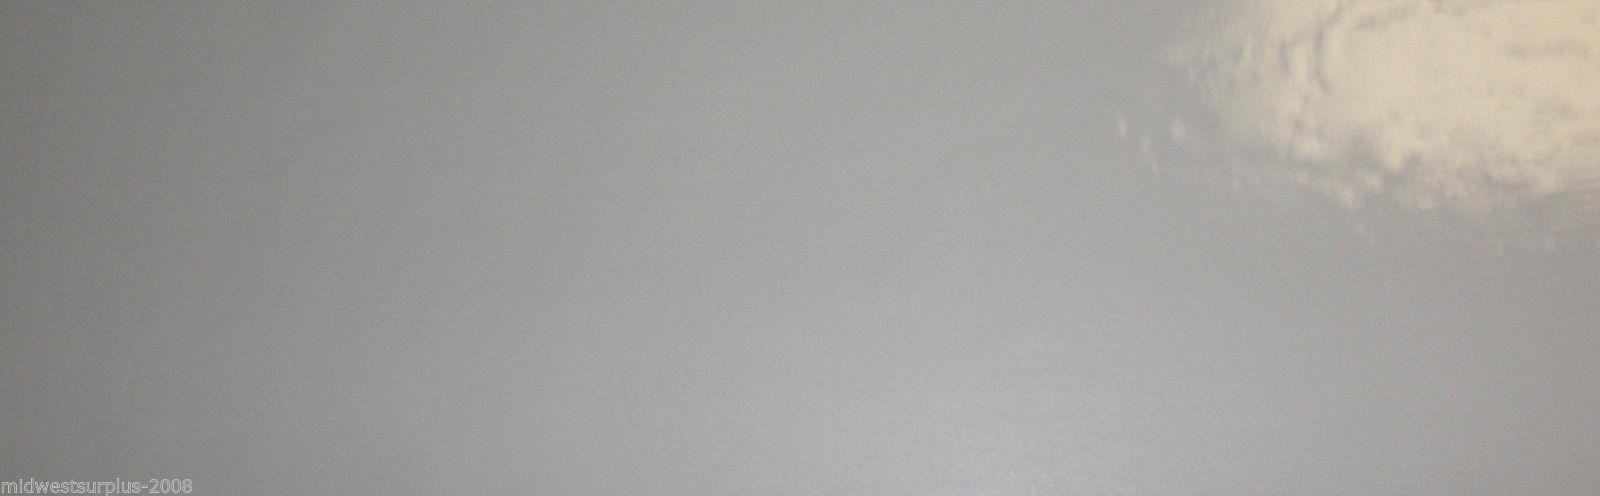 Heartlan RV Silverado Gray Decal Set #14DC14RH/14DC14LH